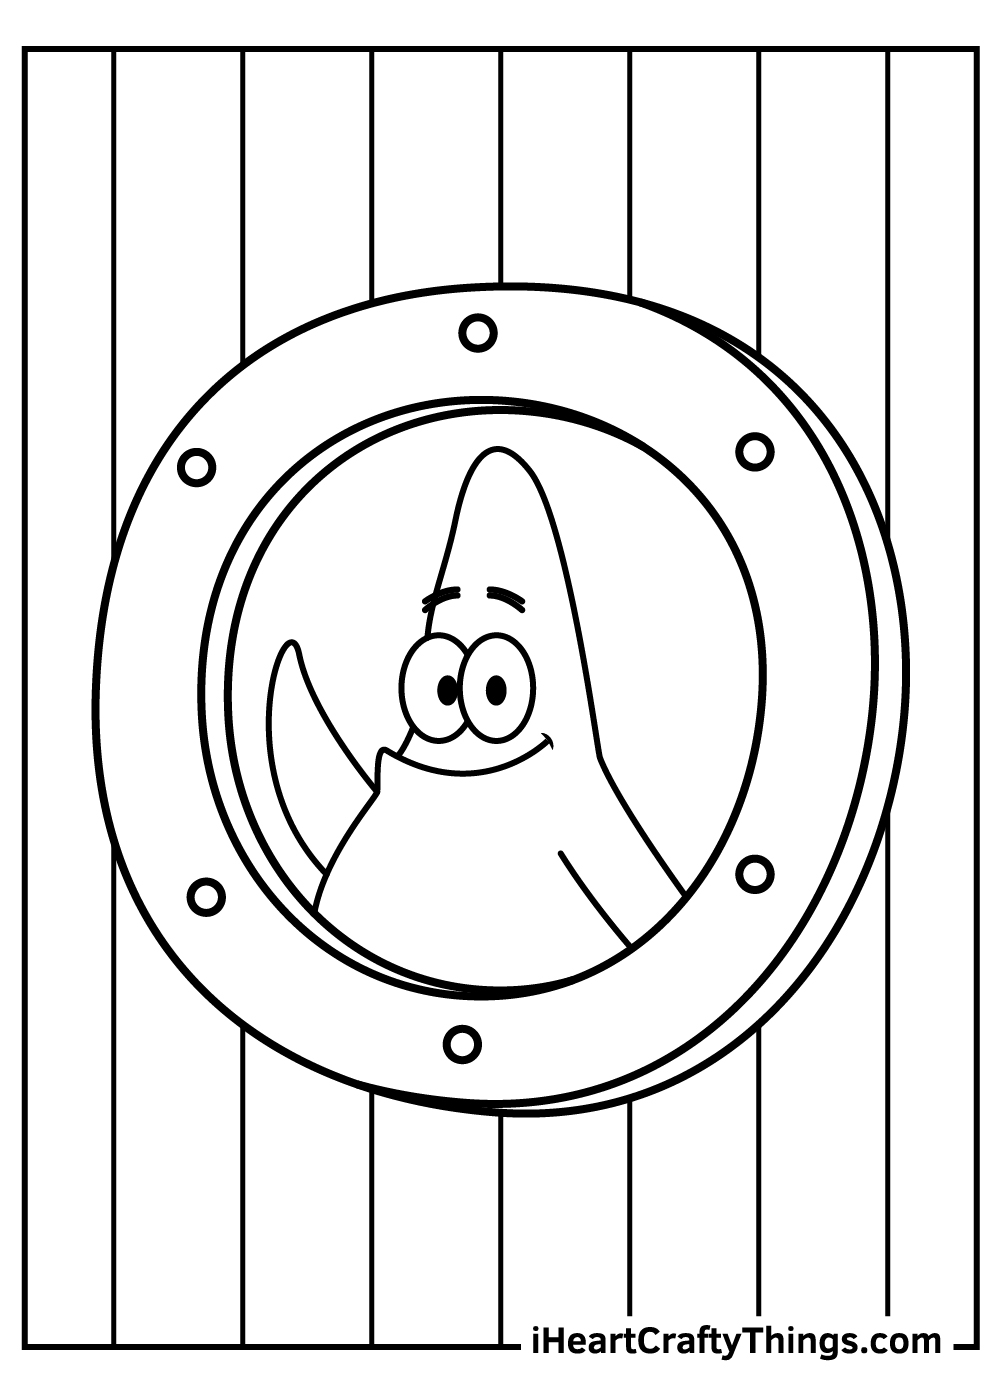 patrick spongebob coloring pagesfree download